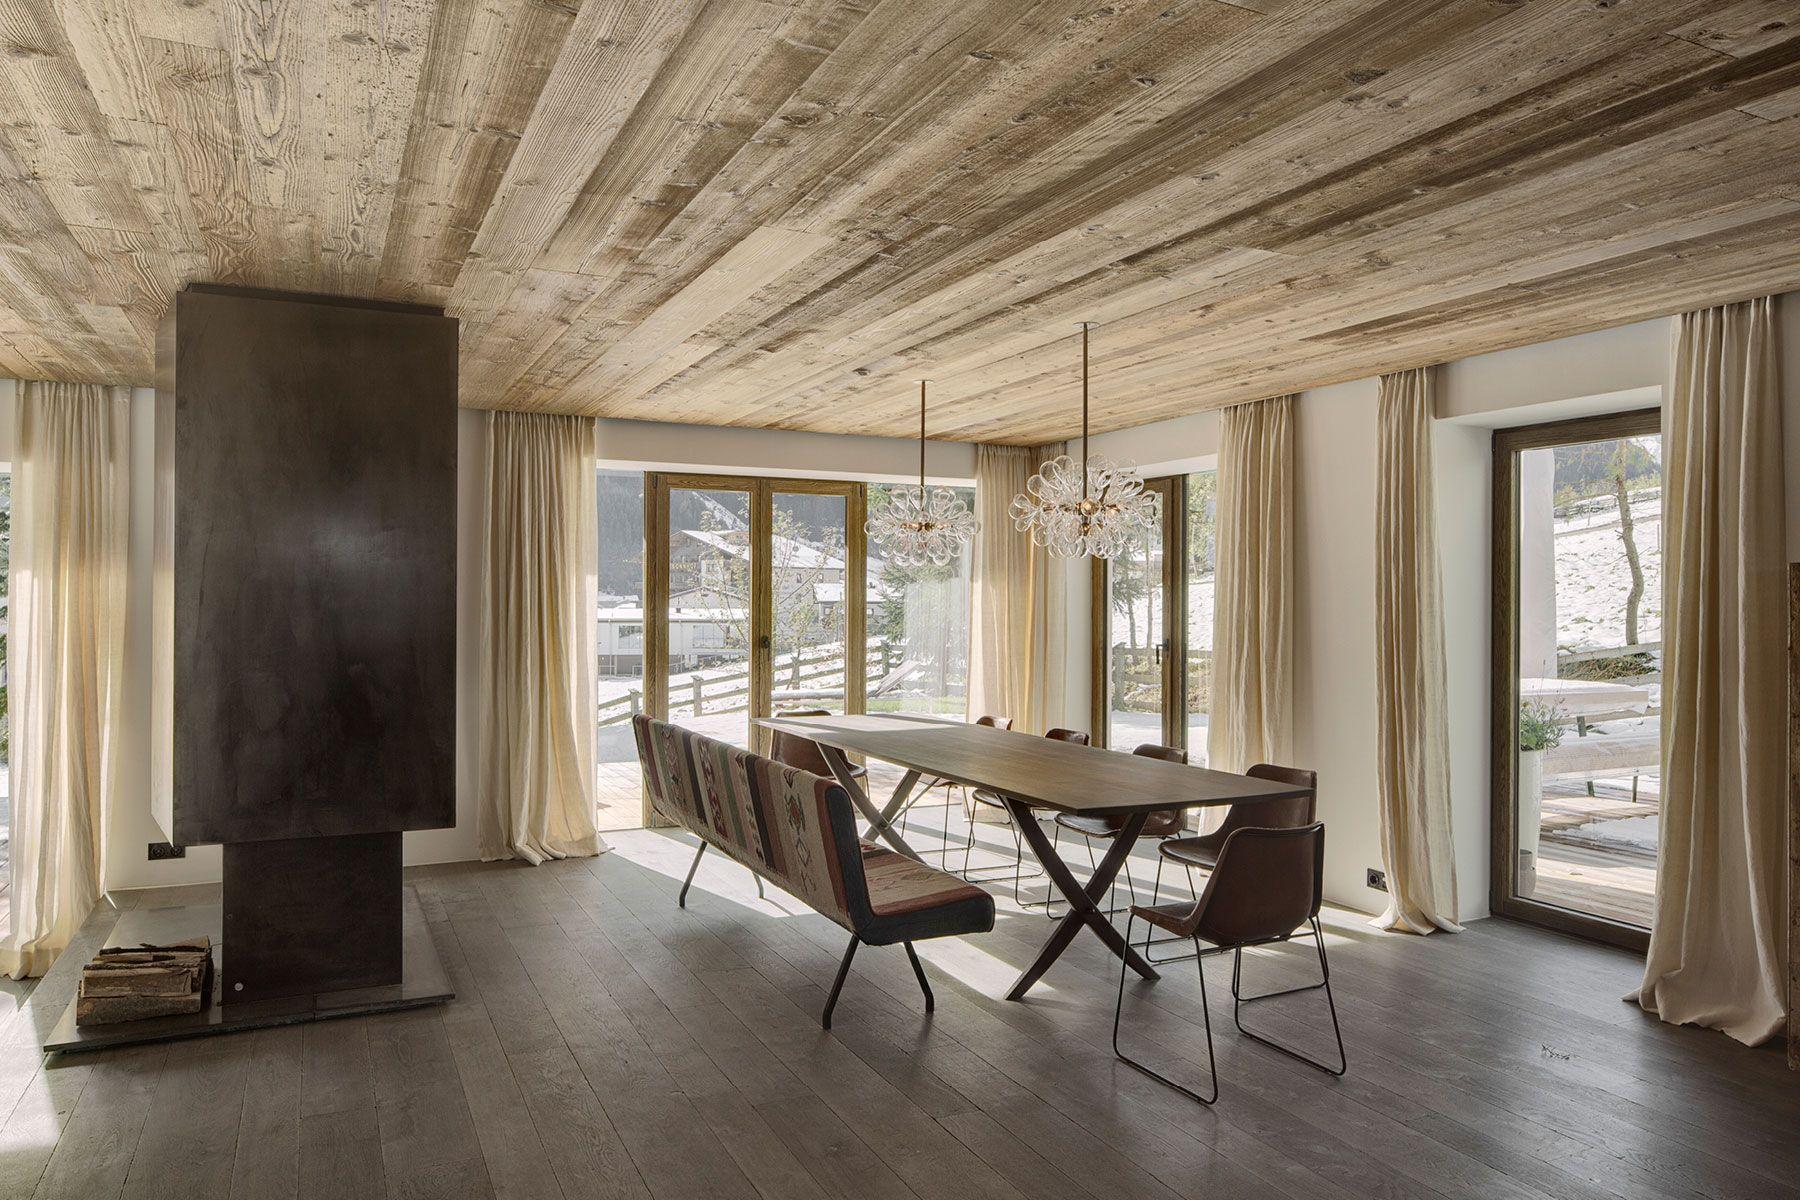 Dining room in haus s in tirol austria designed by gogl for Innendekoration chalet